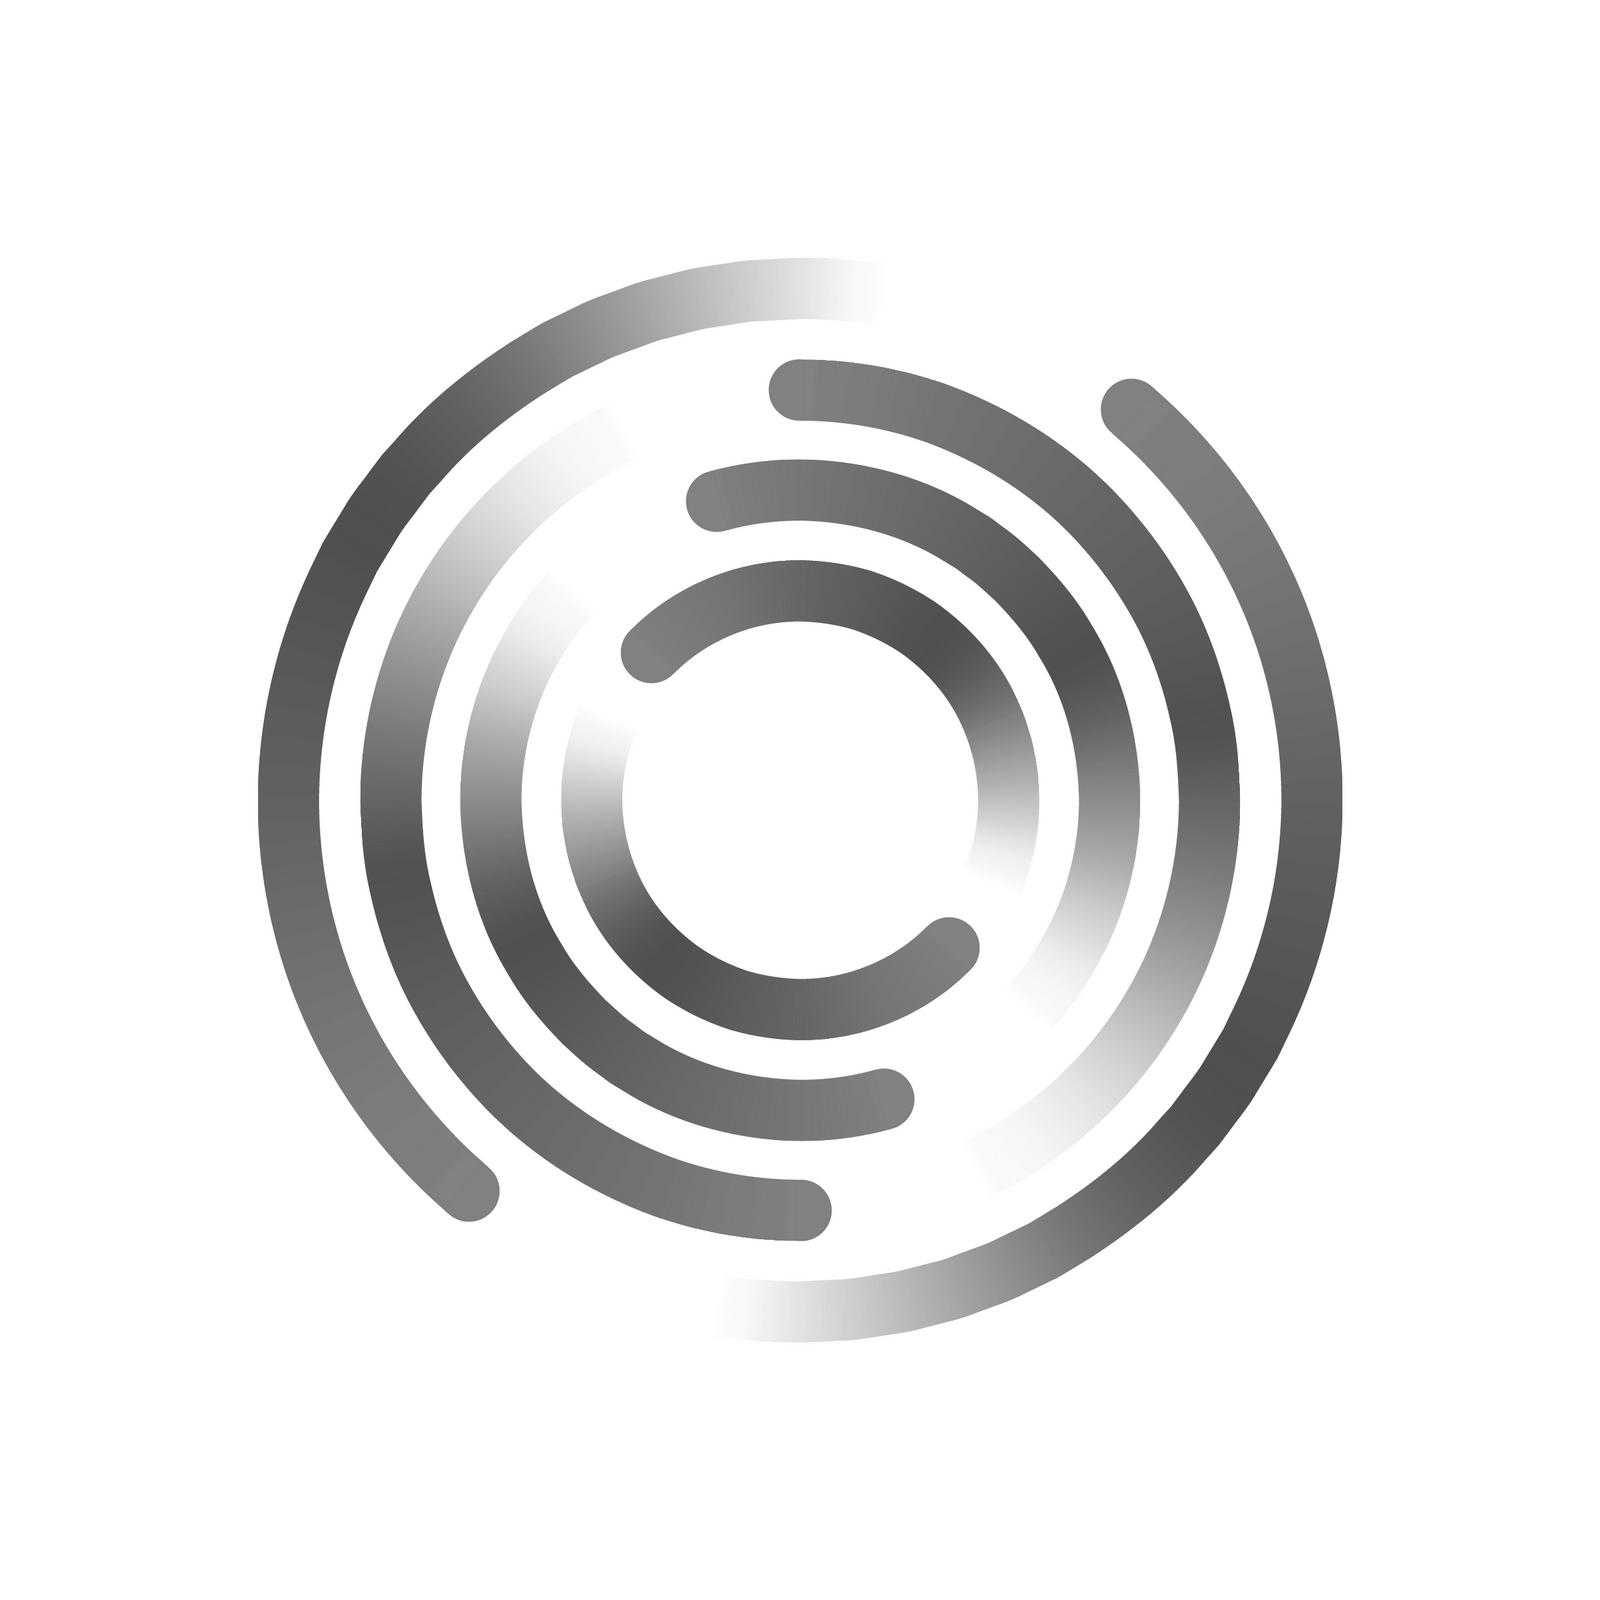 SecureCircle greyscale logo